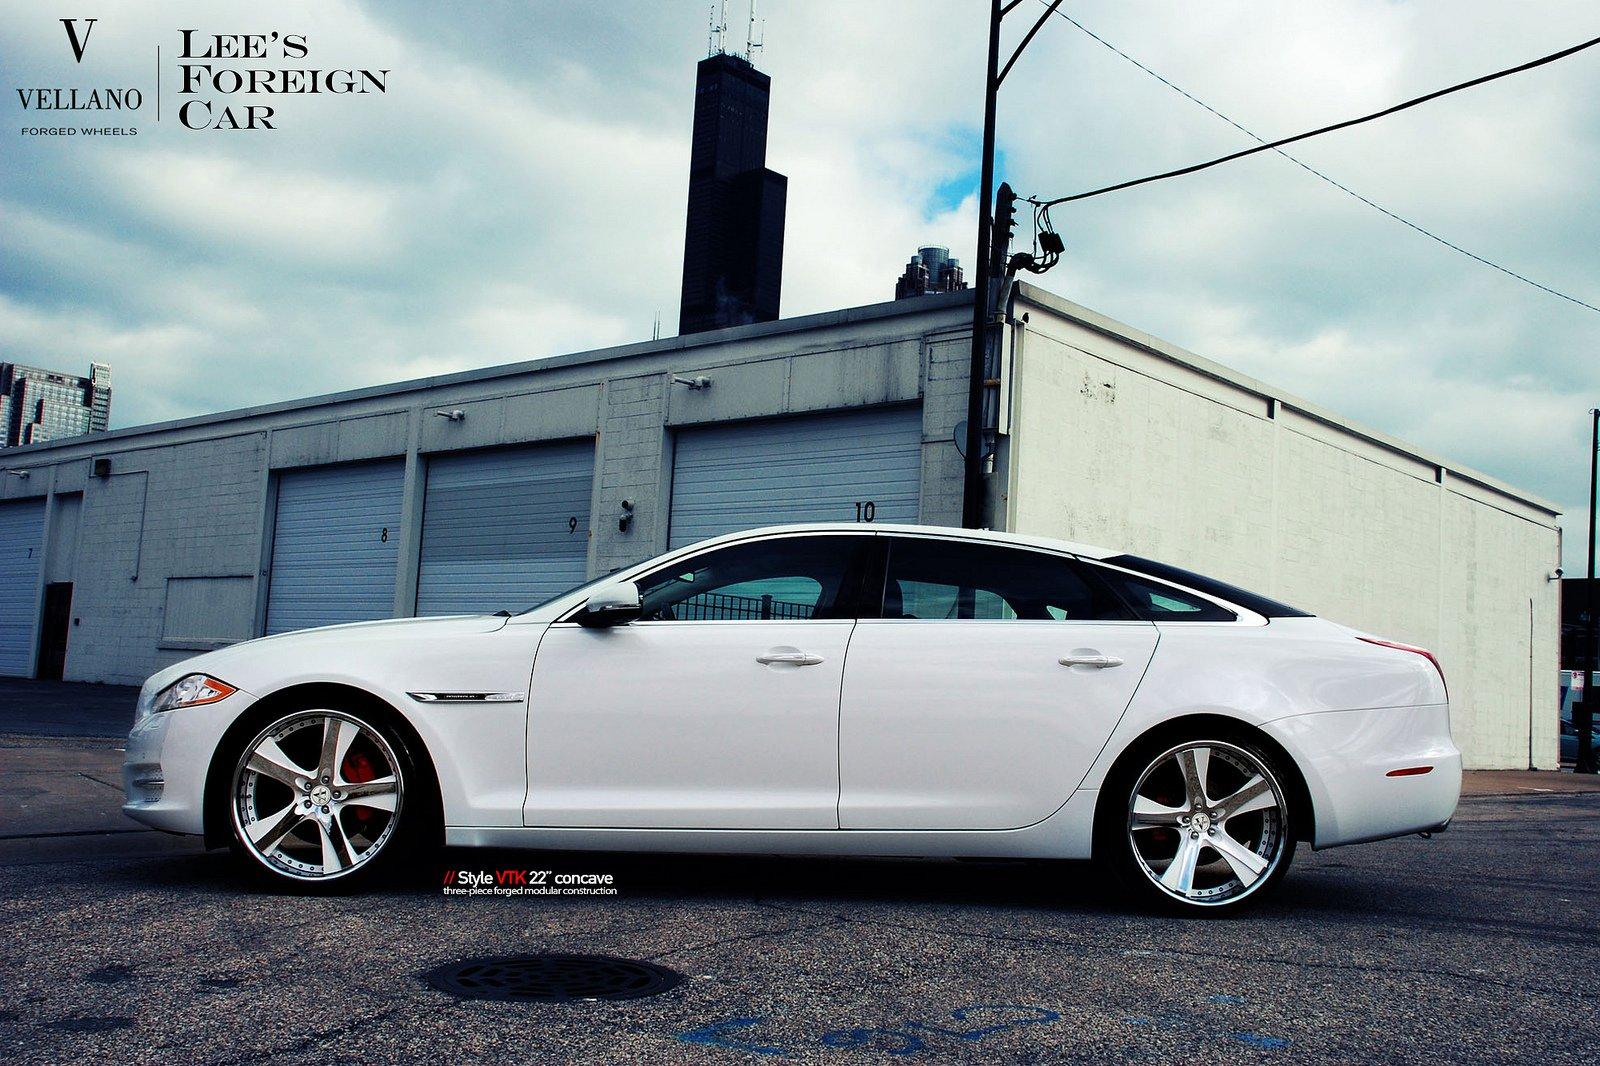 Jaguar Xjl White Vellano Wheels Tuning Cars Wallpaper